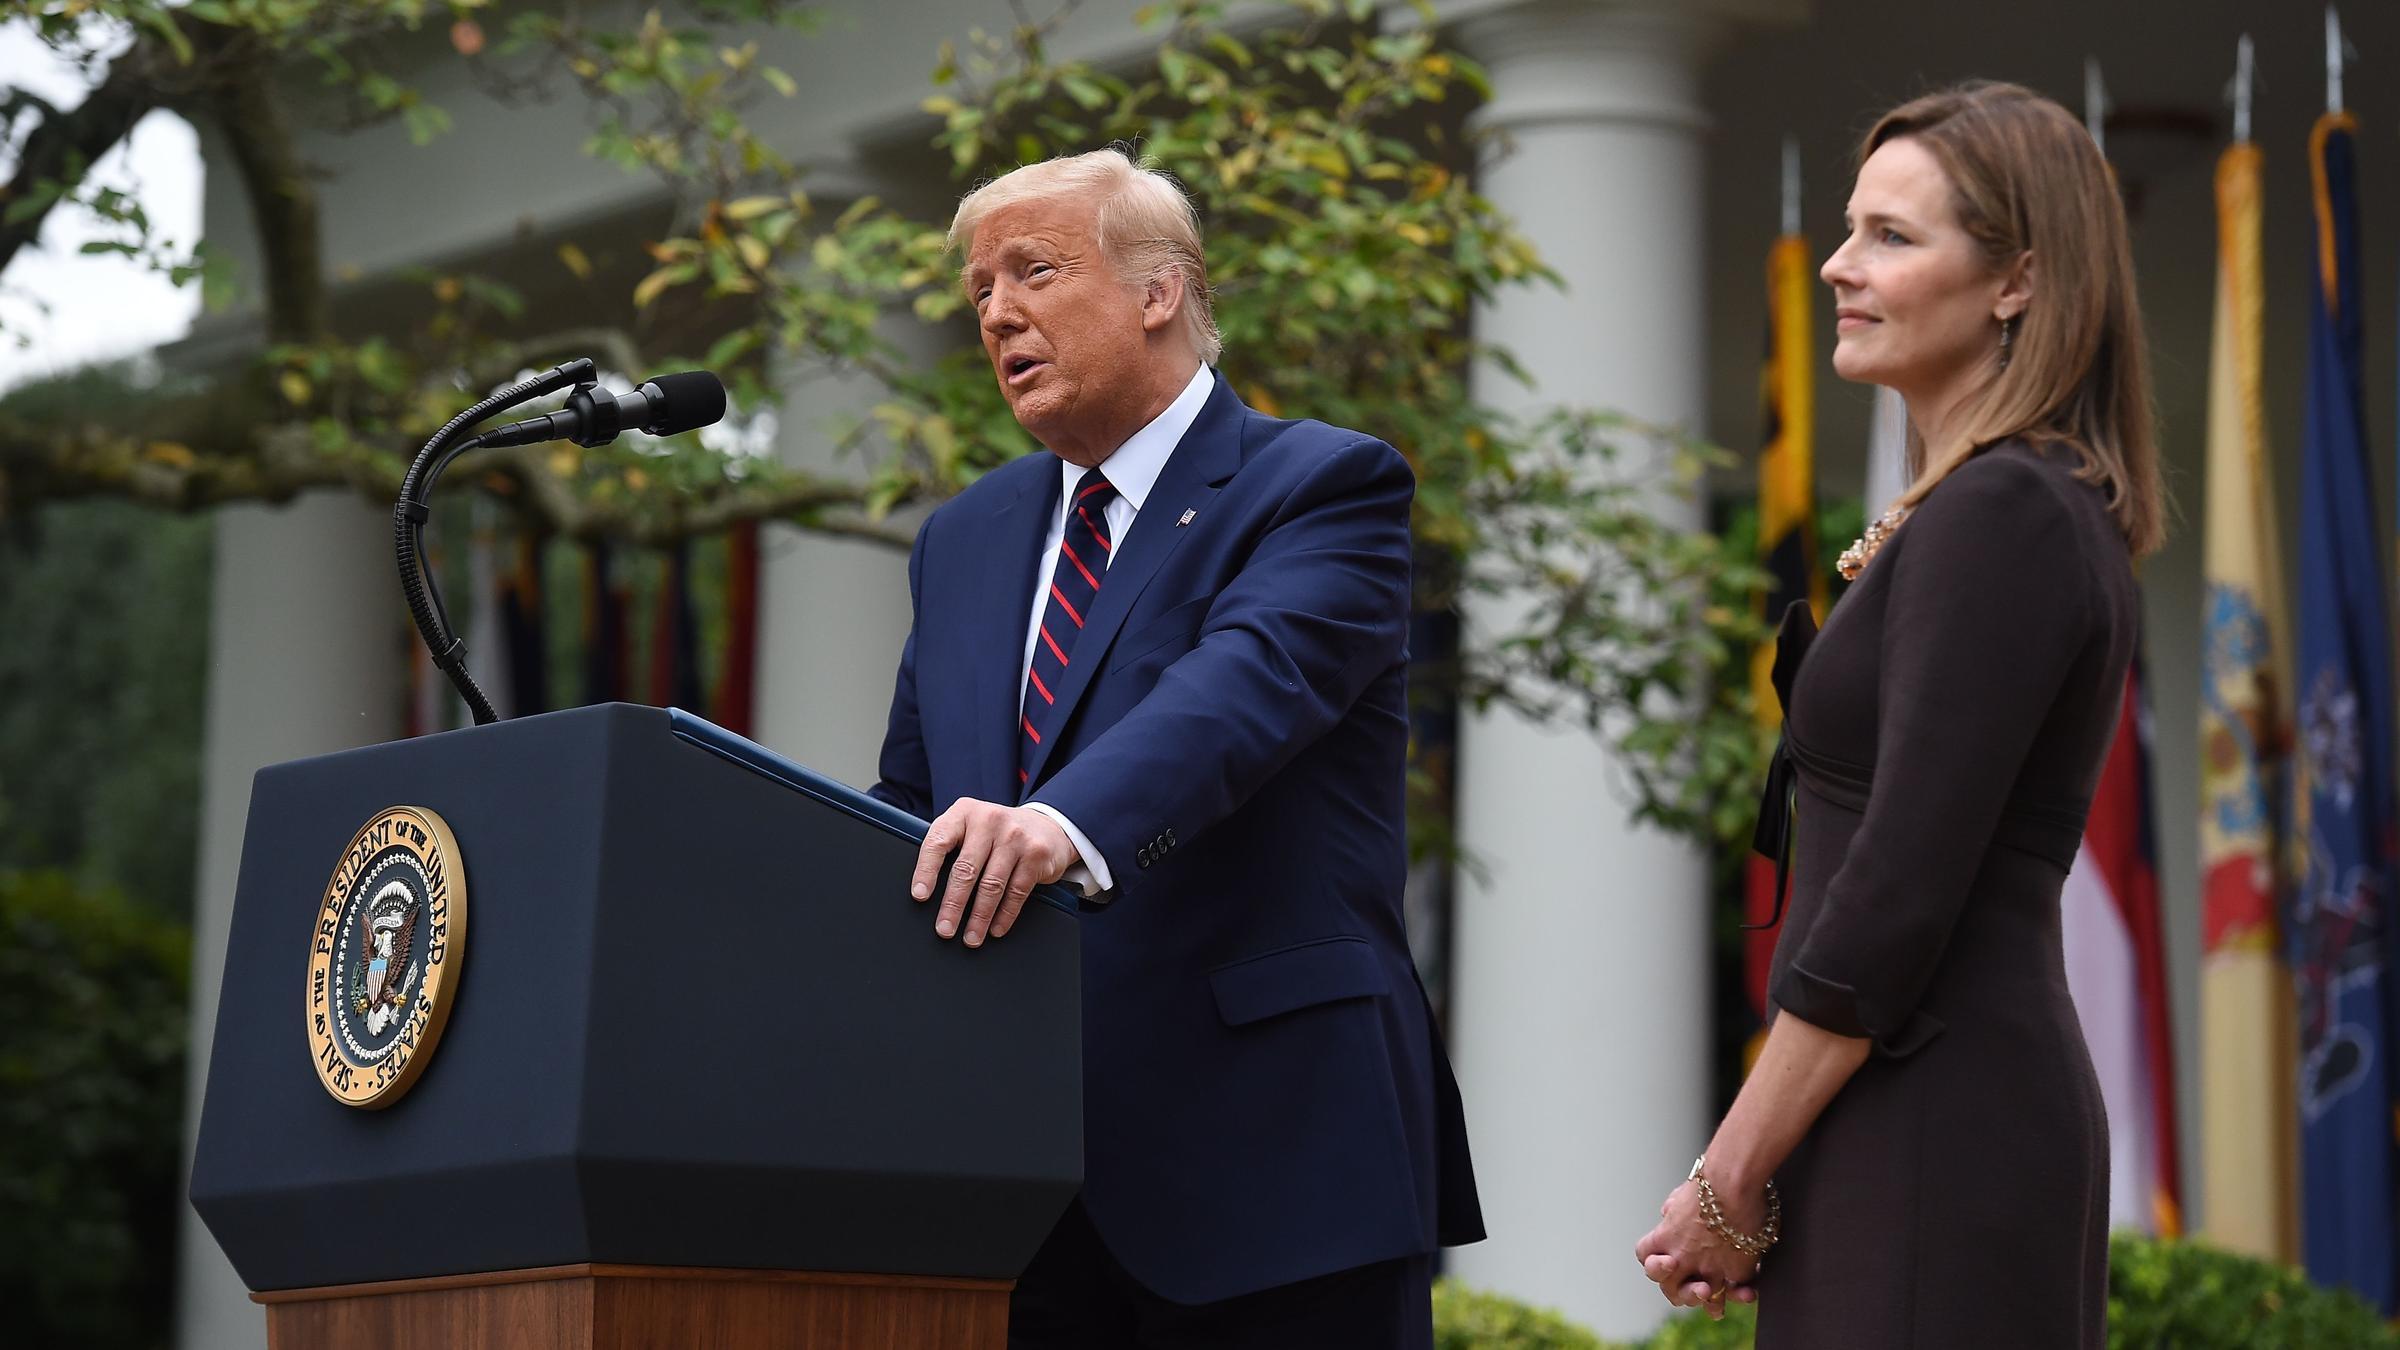 Trump Announces Amy Coney Barrett As His Supreme Court Nominee | KLCC